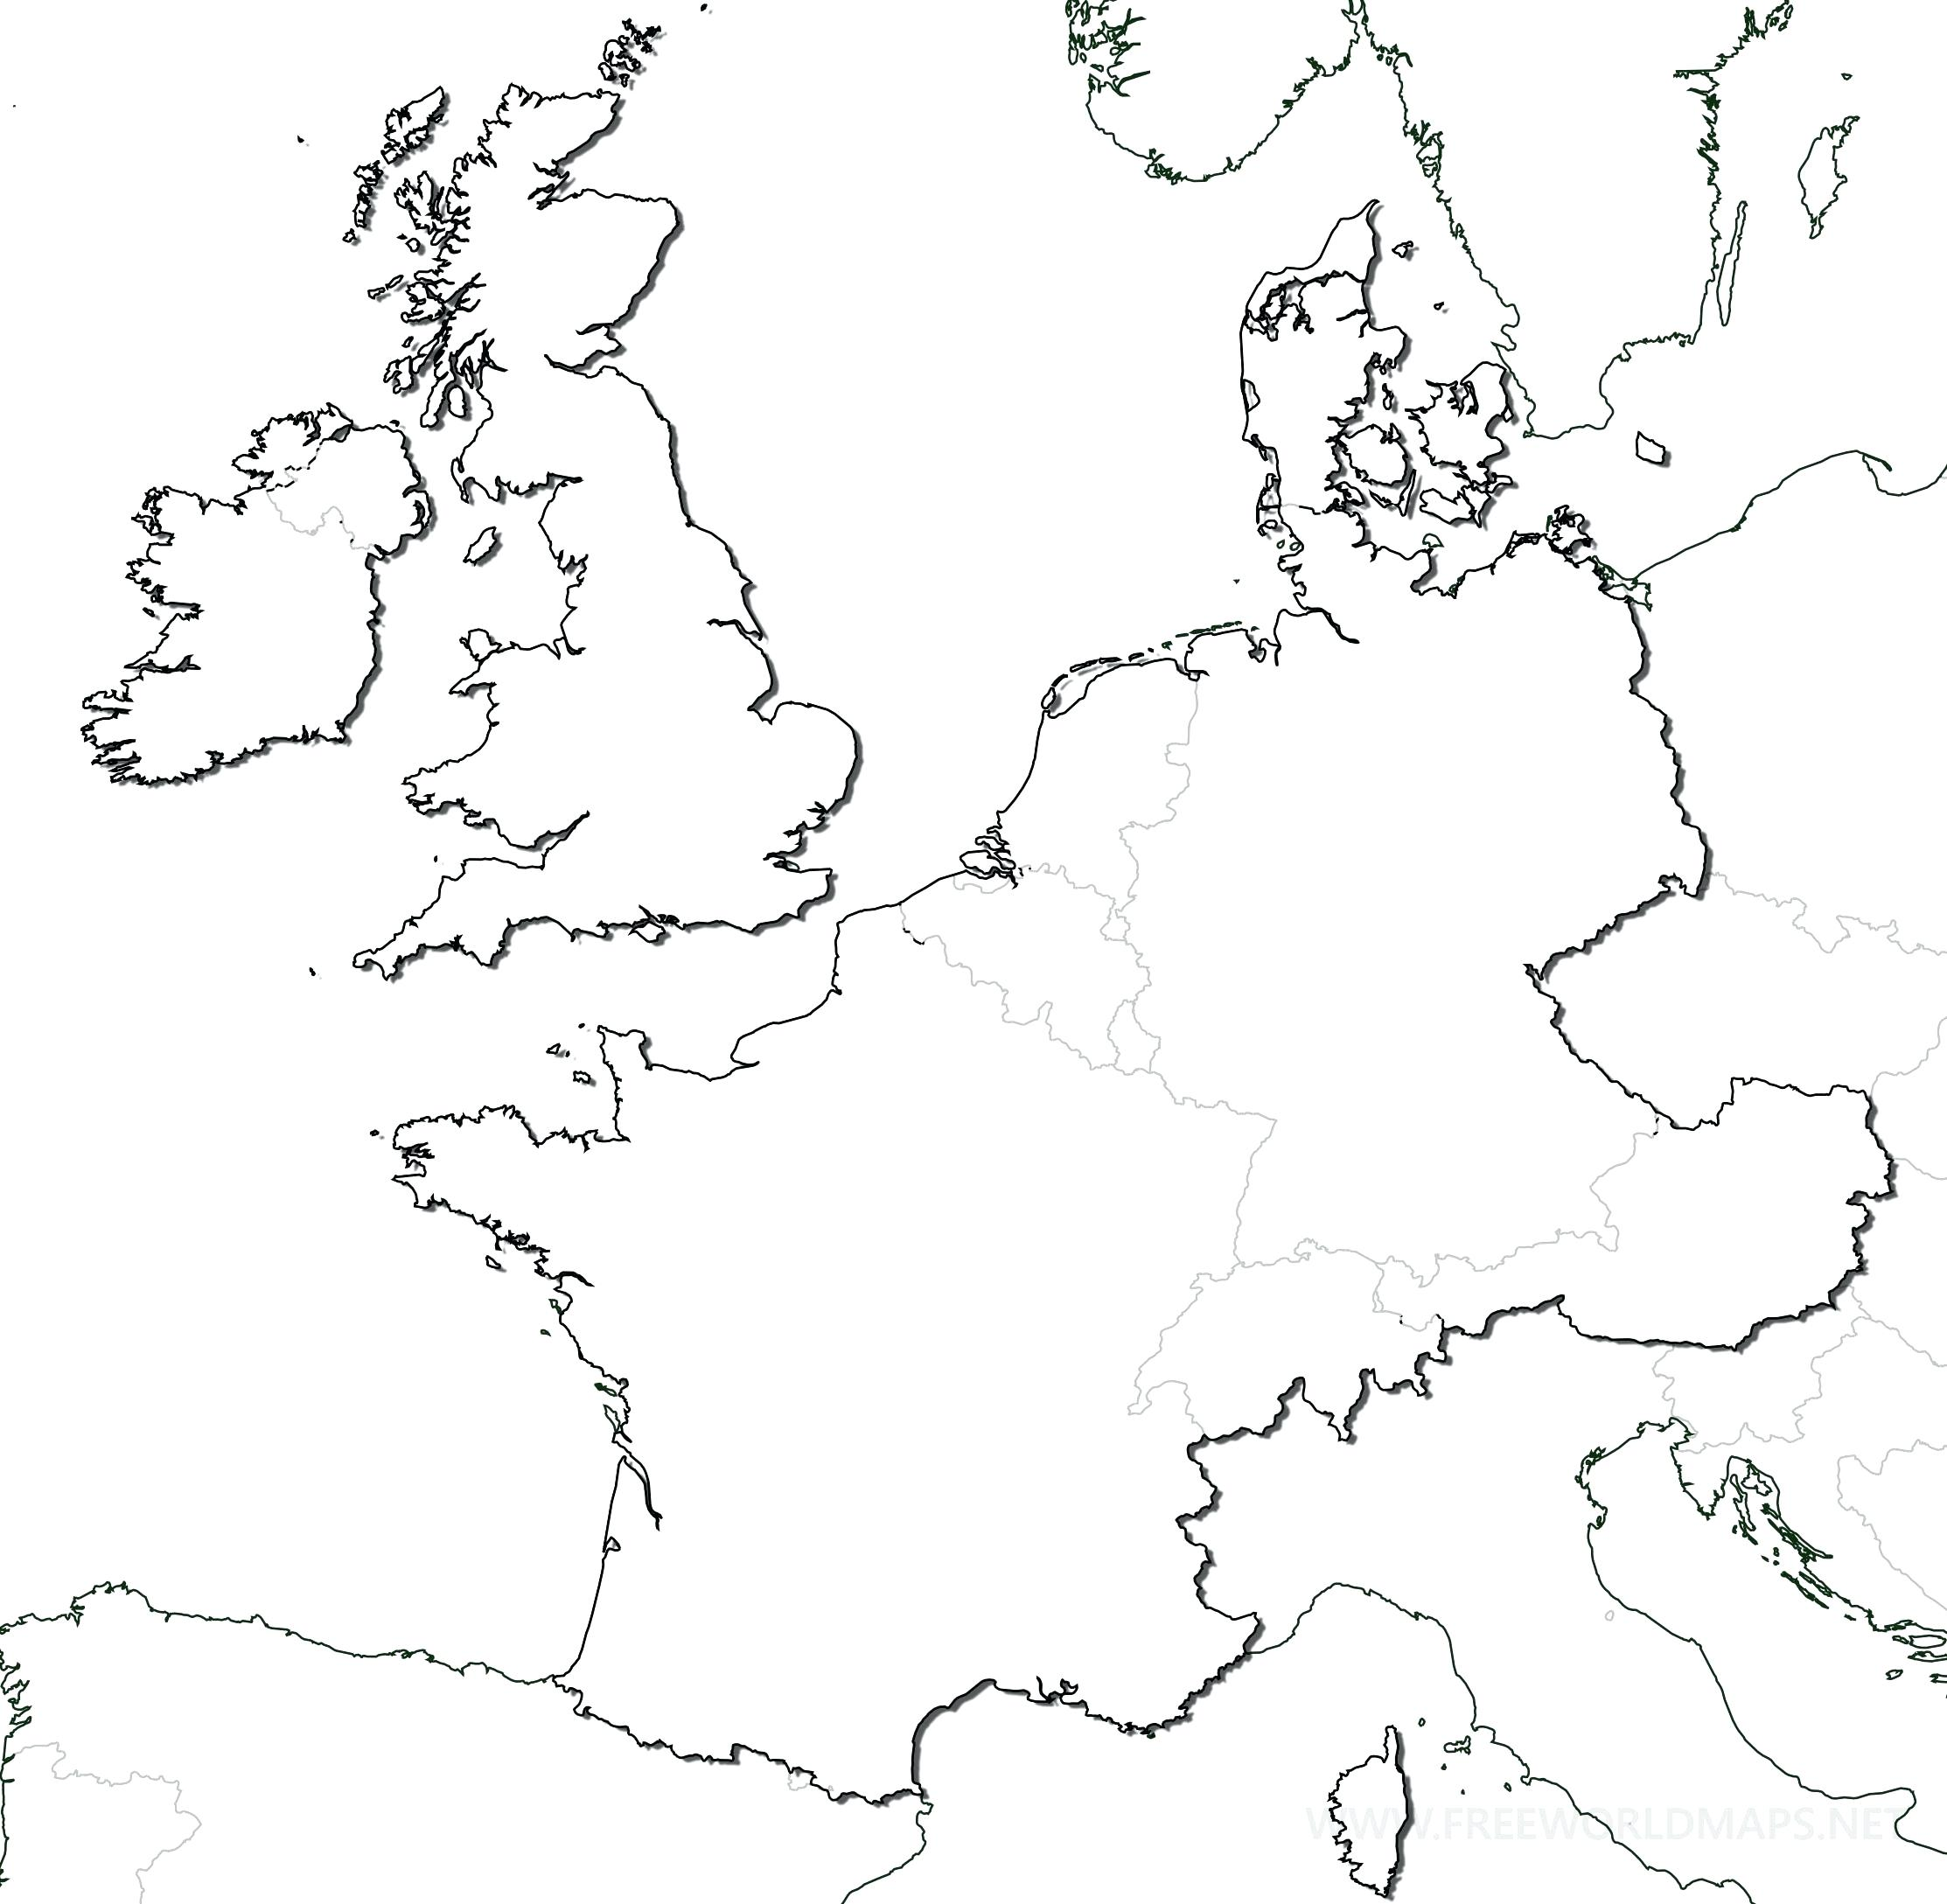 2226x2177 Printable Blank Europe Map Outline Printable On Of Western. Blank